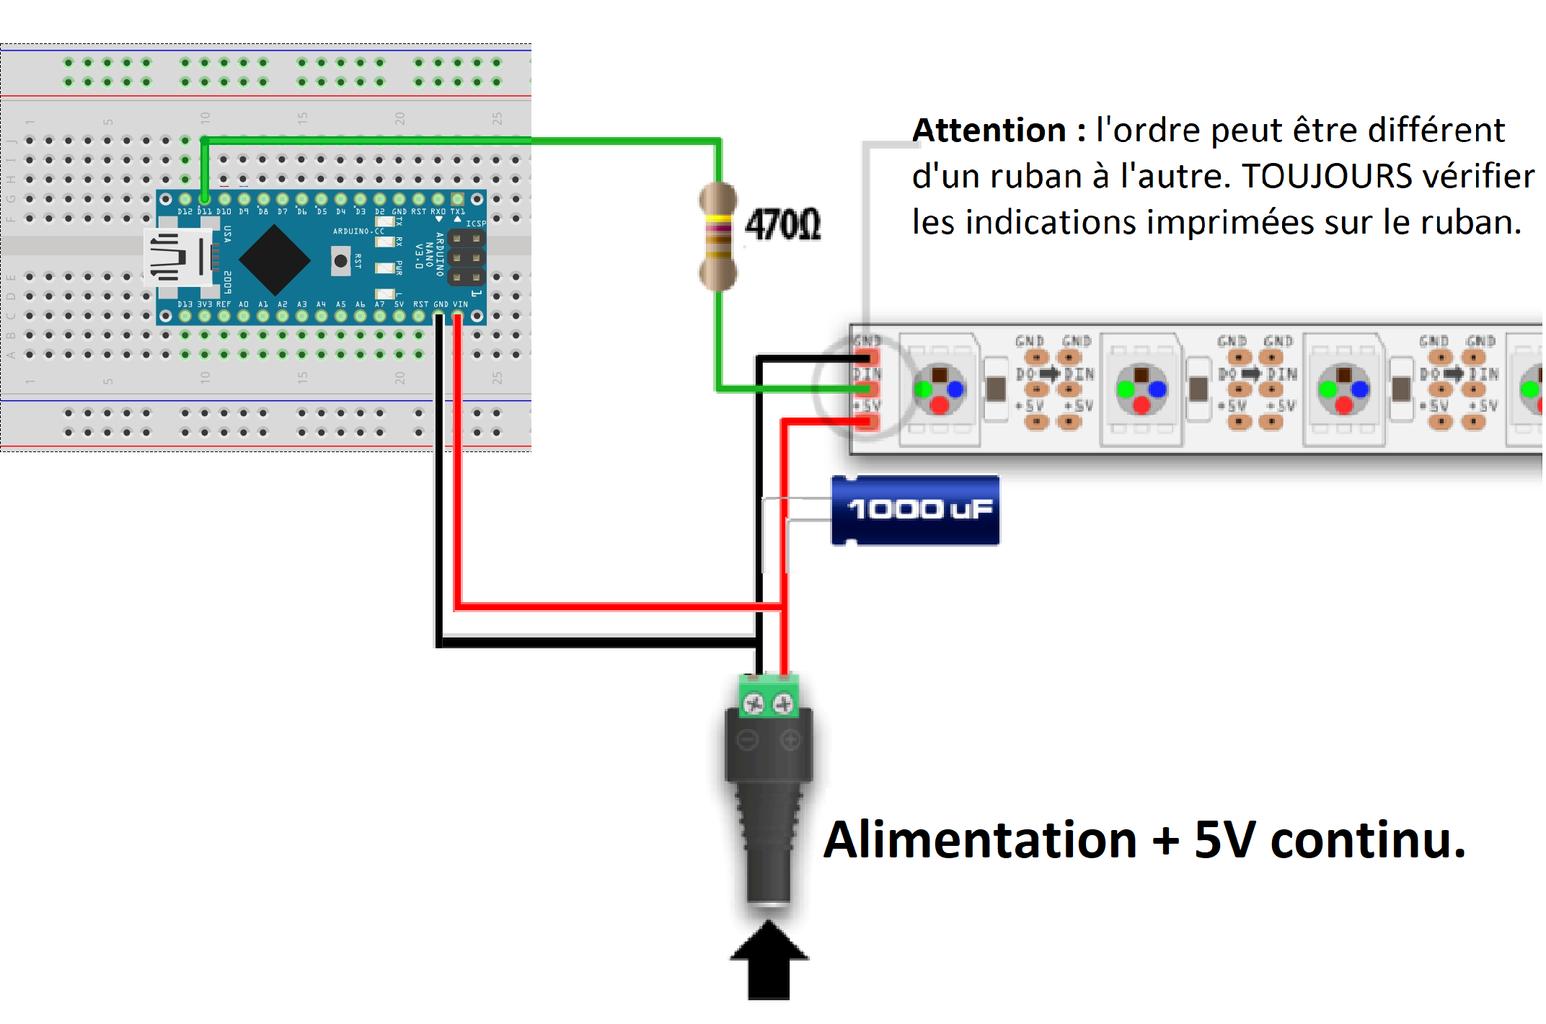 CHOIX 1 : Carte Arduino Téléverser Le Programme Dans L'arduino / CHOICE 1: Arduino Card Upload the Program Into the Arduino